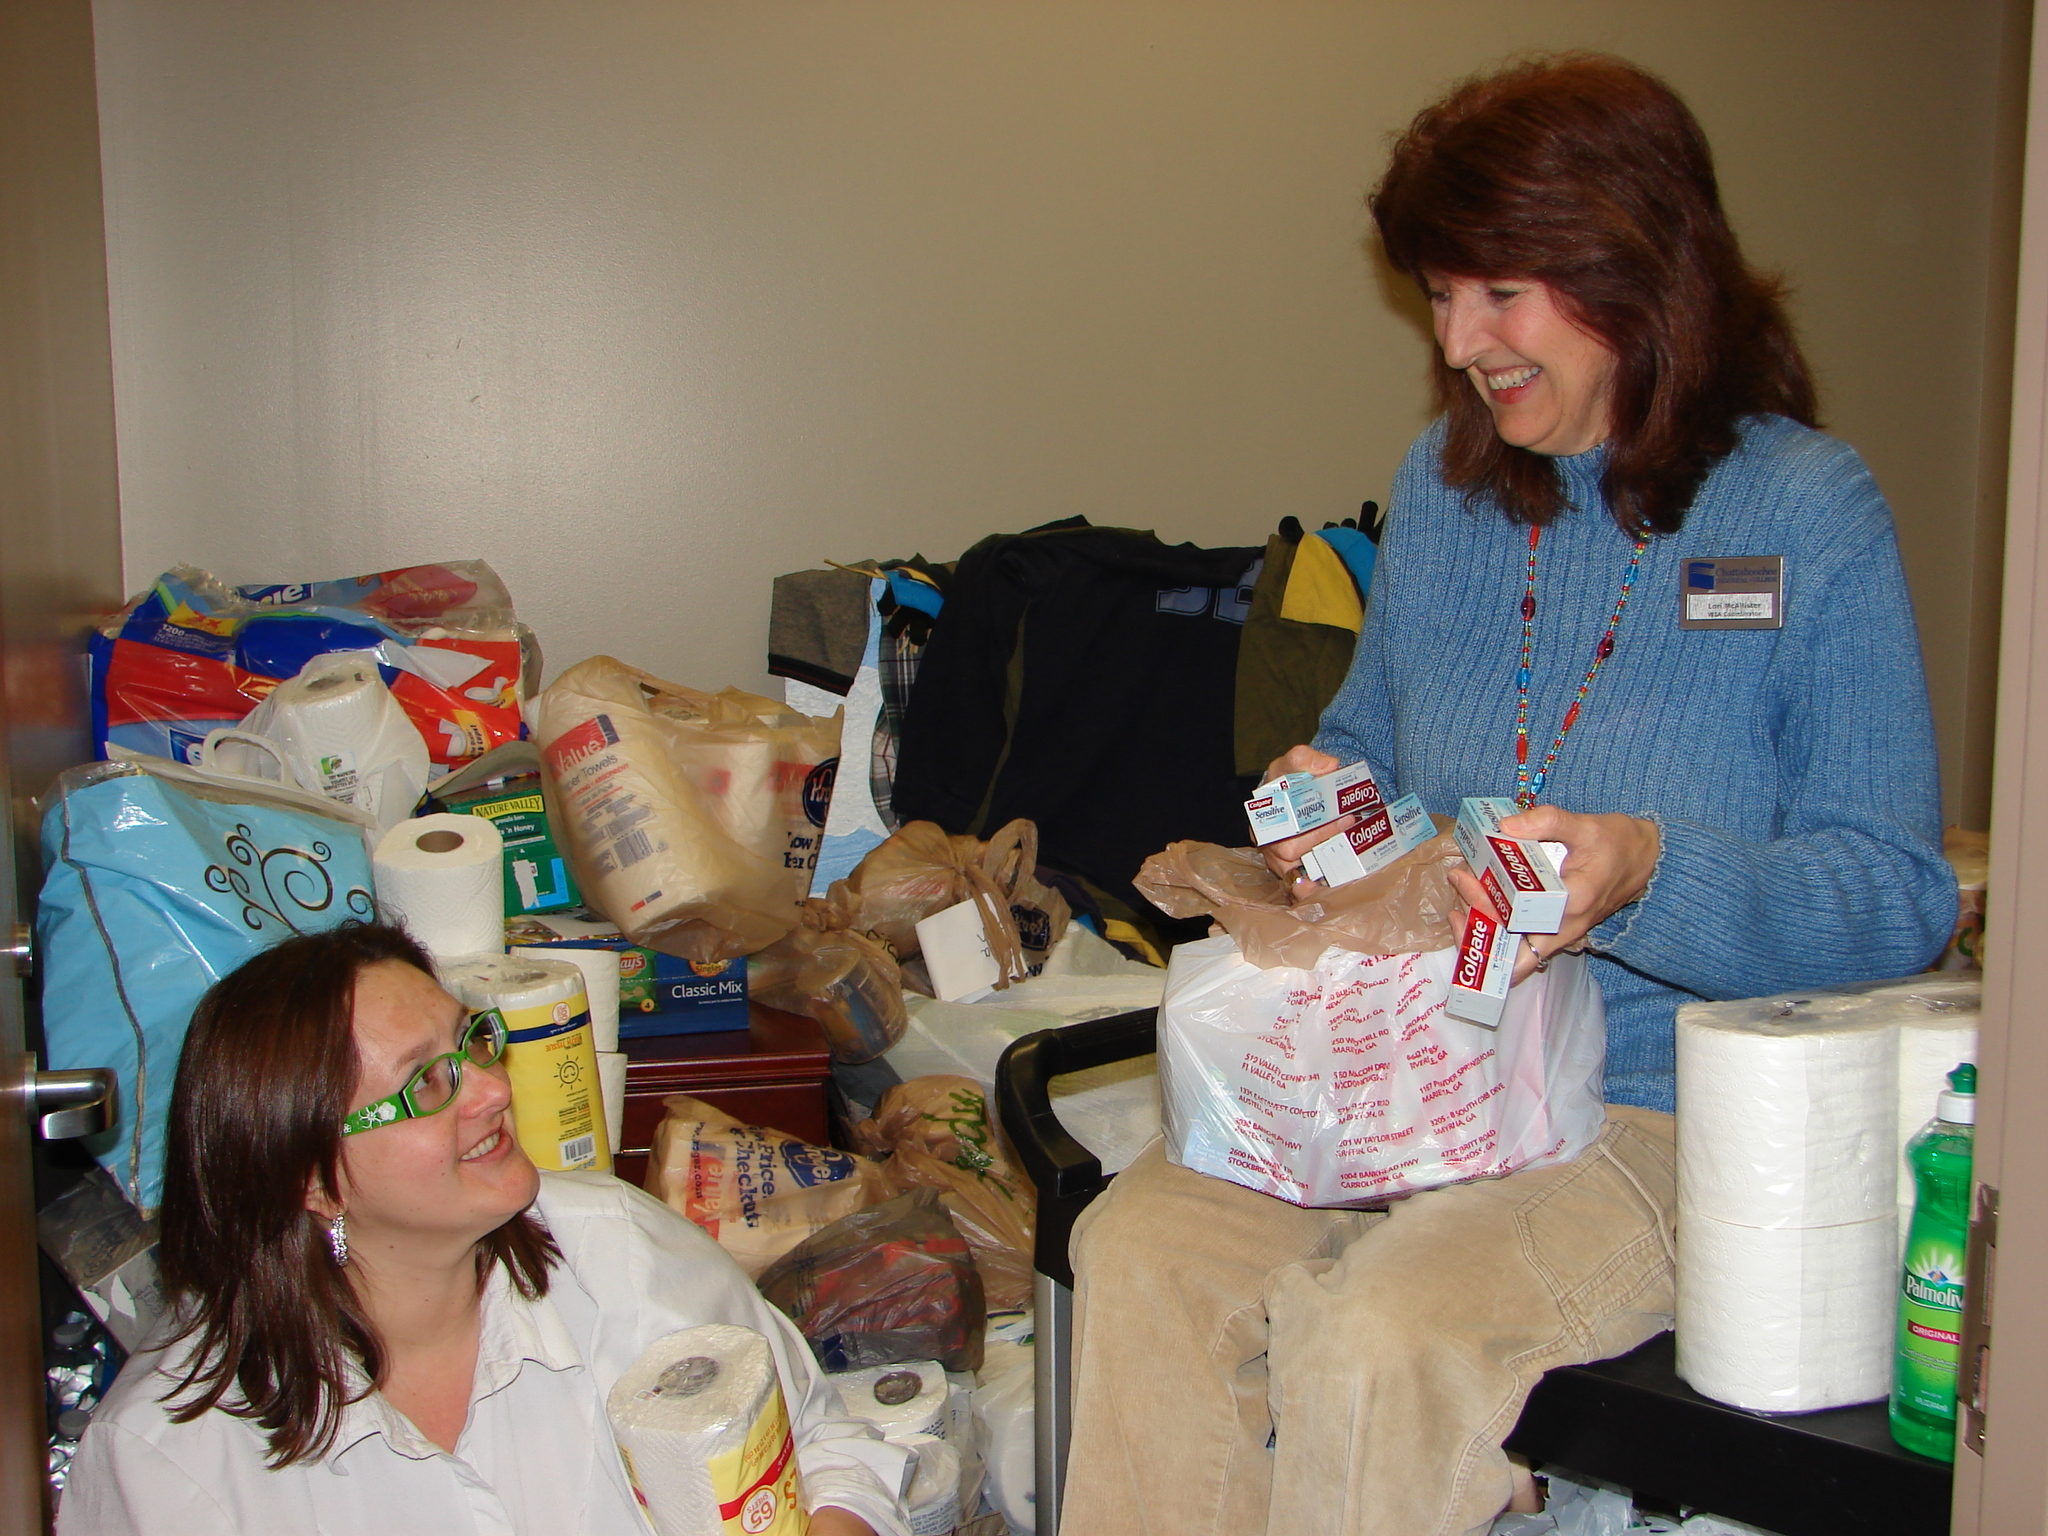 Pickens cares donation - 2 ladies smiling